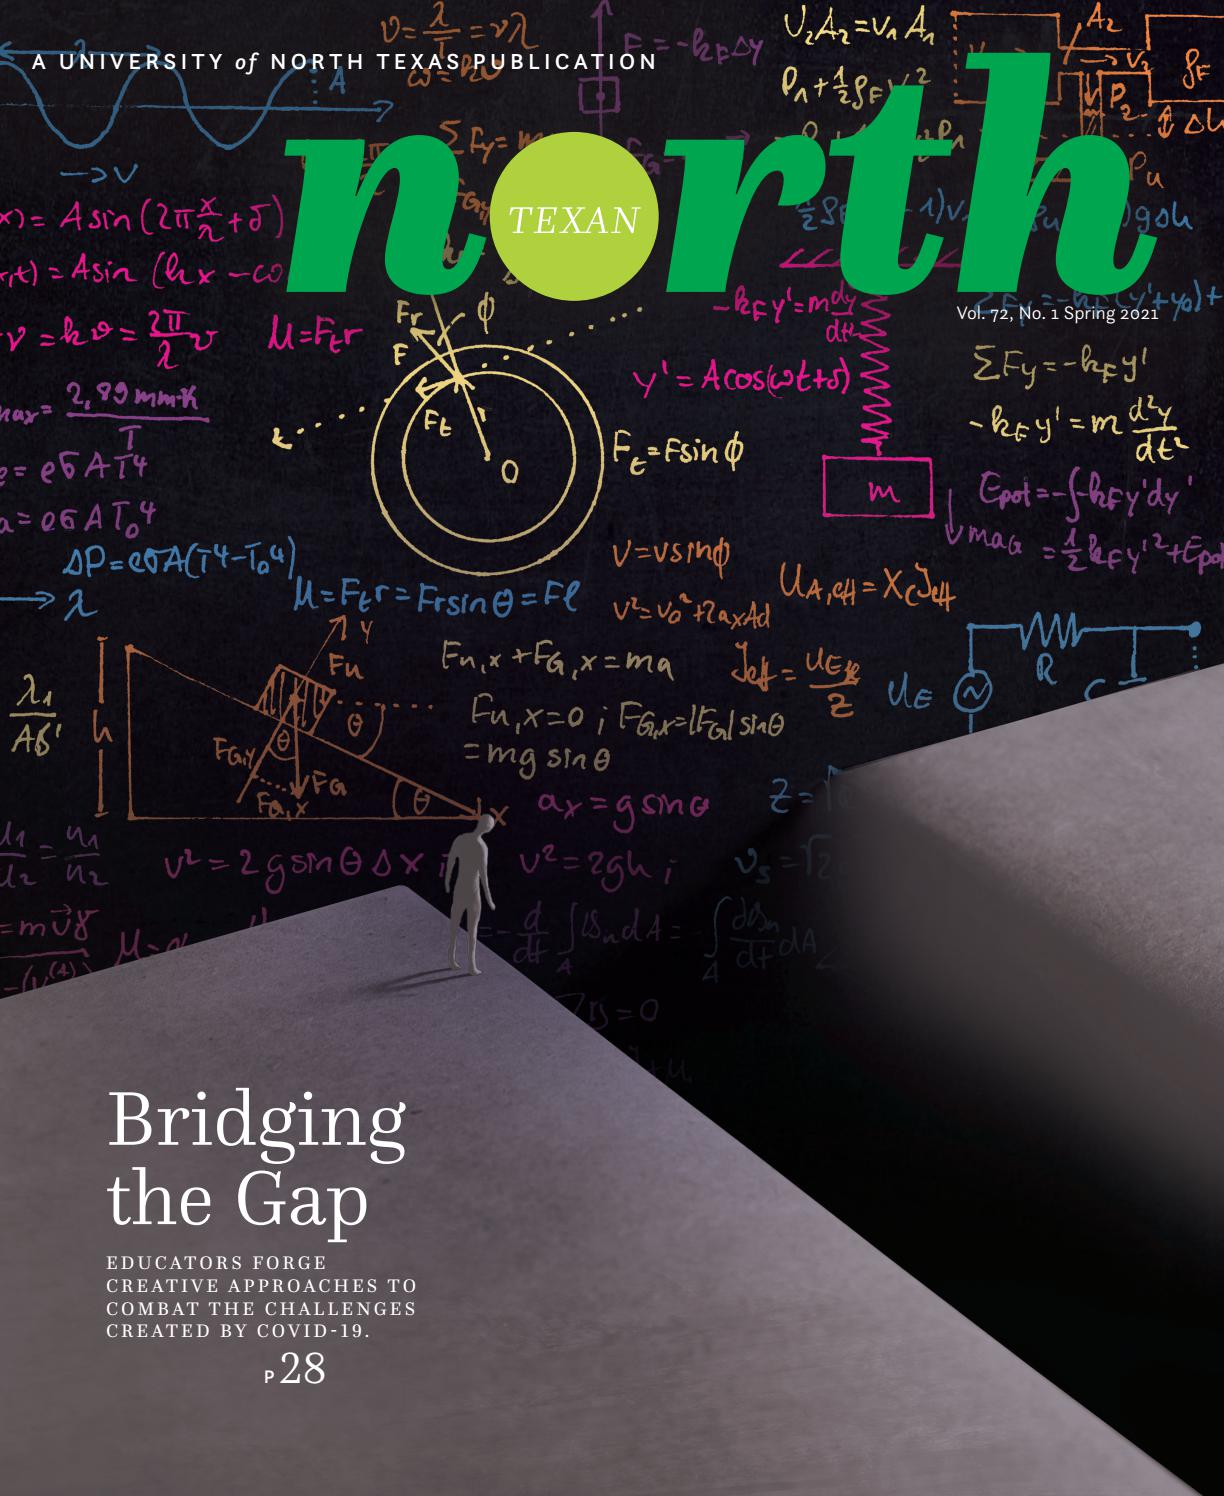 Unt Academic Calendar 2022.The North Texan Unt Alumni Magazine Spring 2021 By University Of North Texas Issuu